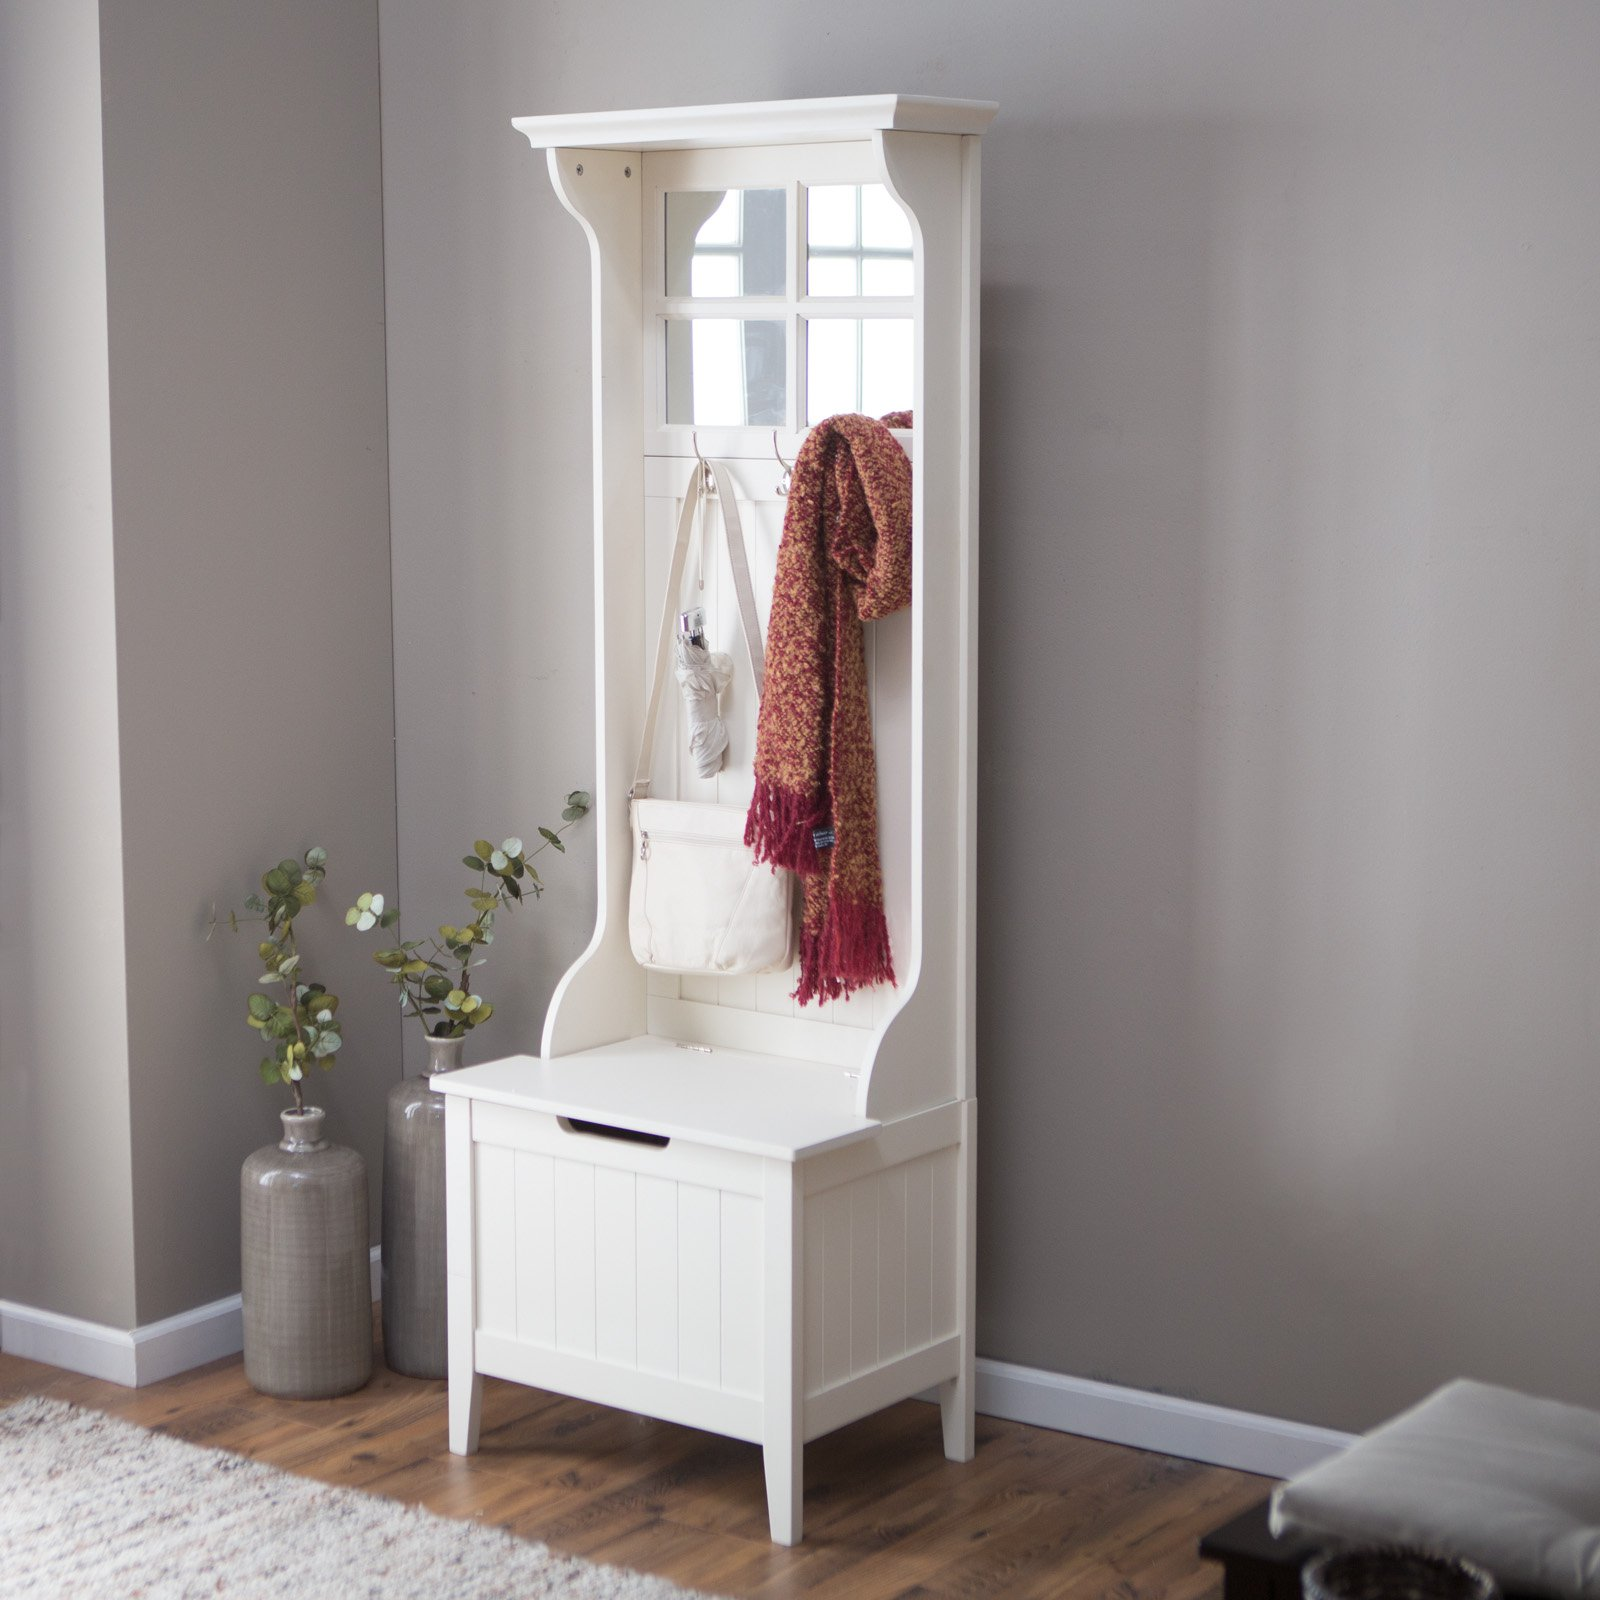 Small Hall Furniture. Small Hall Furniture C